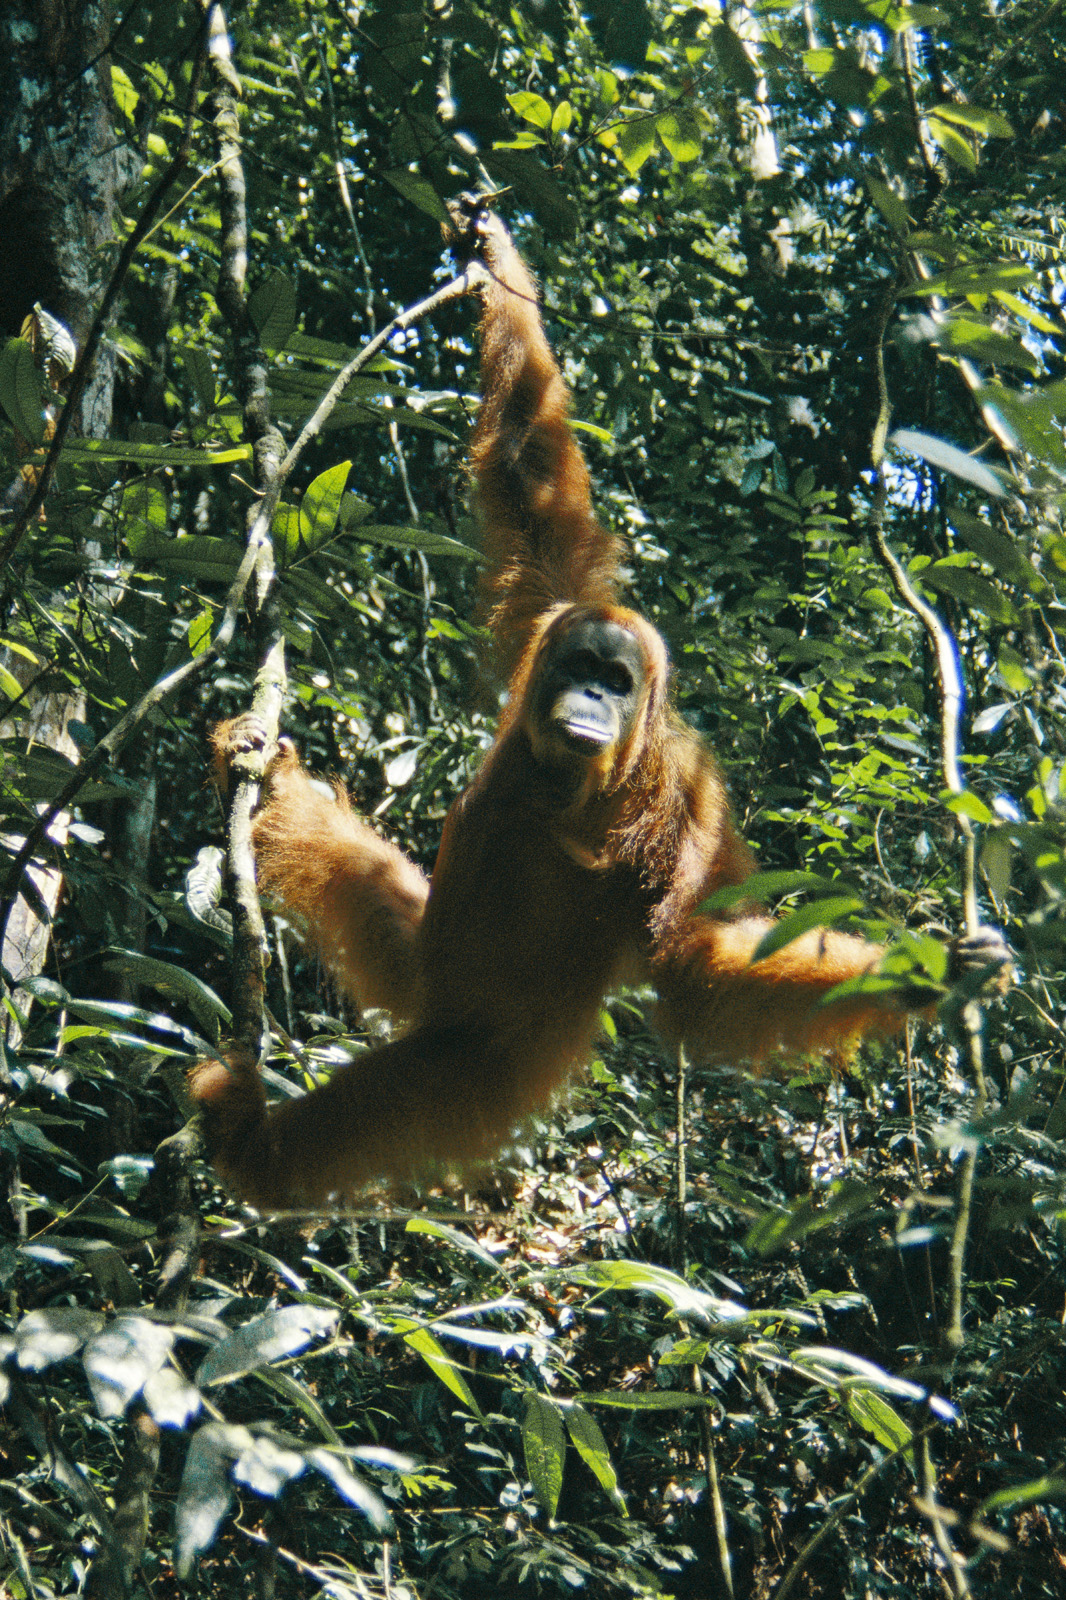 An orangutan in Sundaland, one of Earth's Three Green Hearts